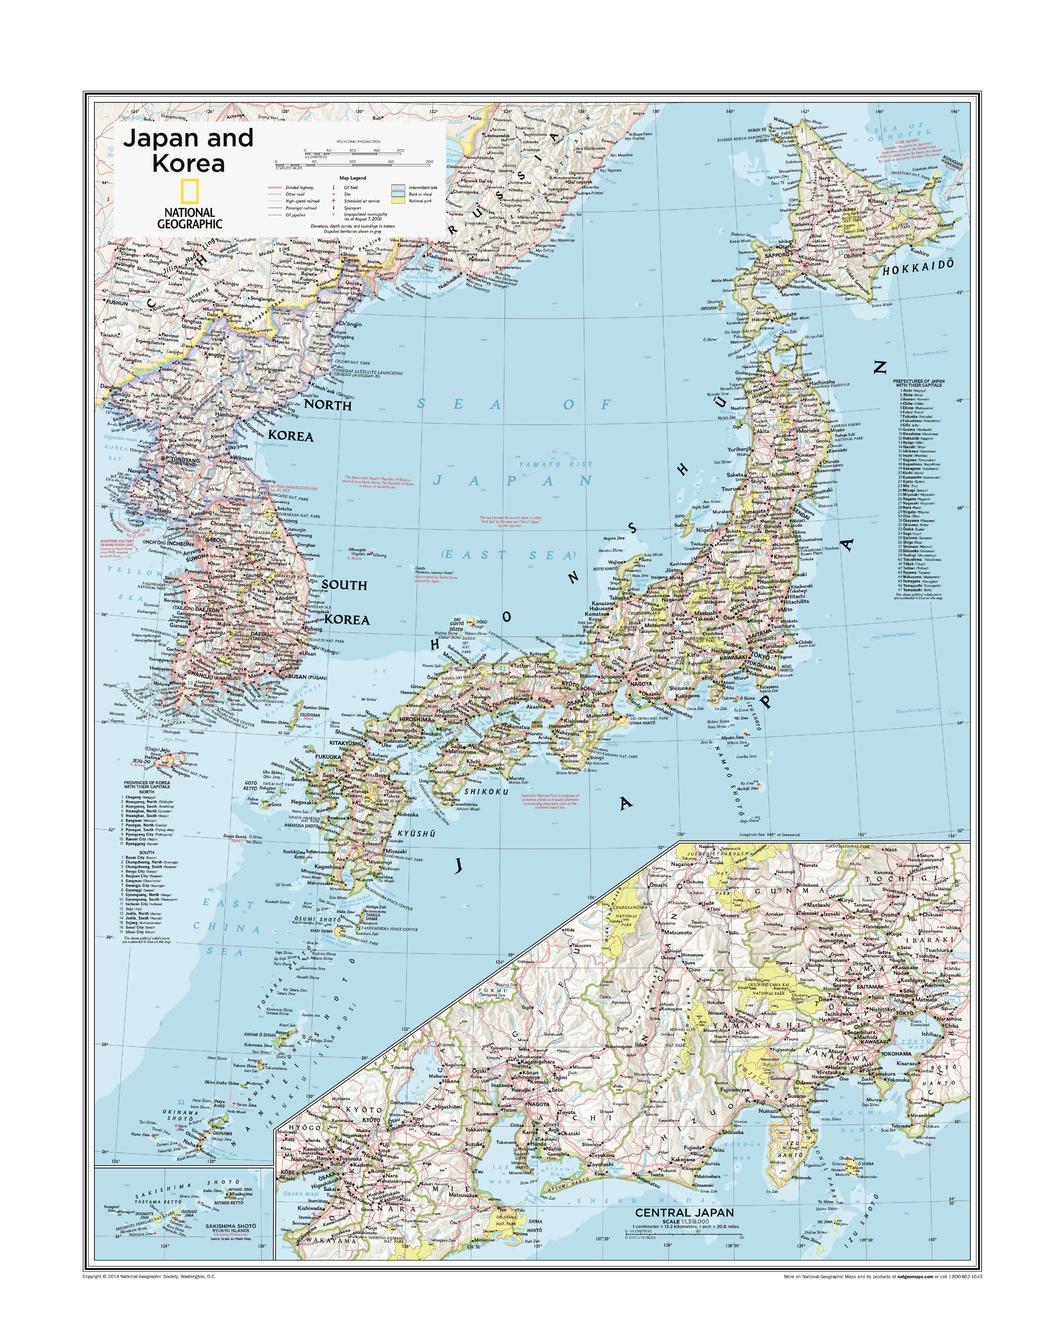 Japan And Korea Atlas Of The World 10th Edition